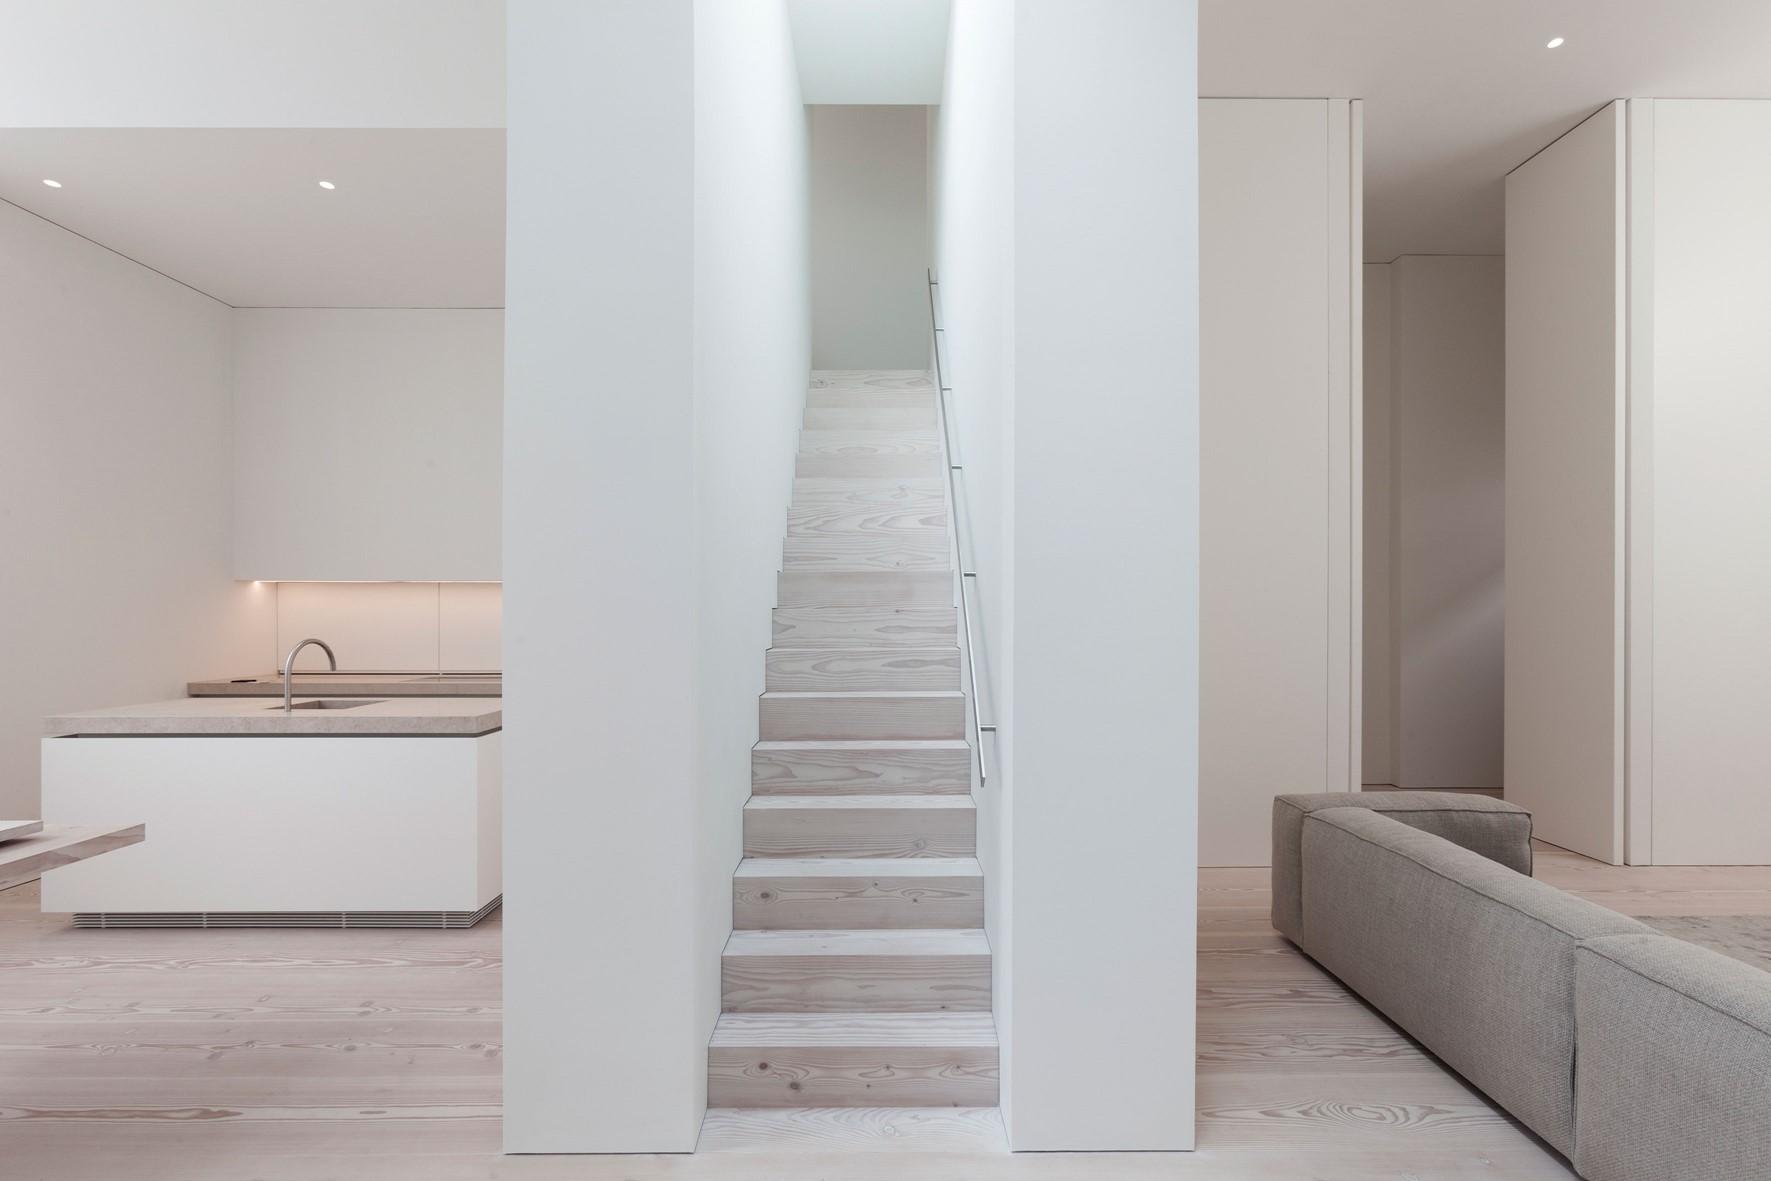 douglas-plank-floor_lye-and-natural-oil_coach-house-amsterdam_staircase-wood_dinesen.jpg